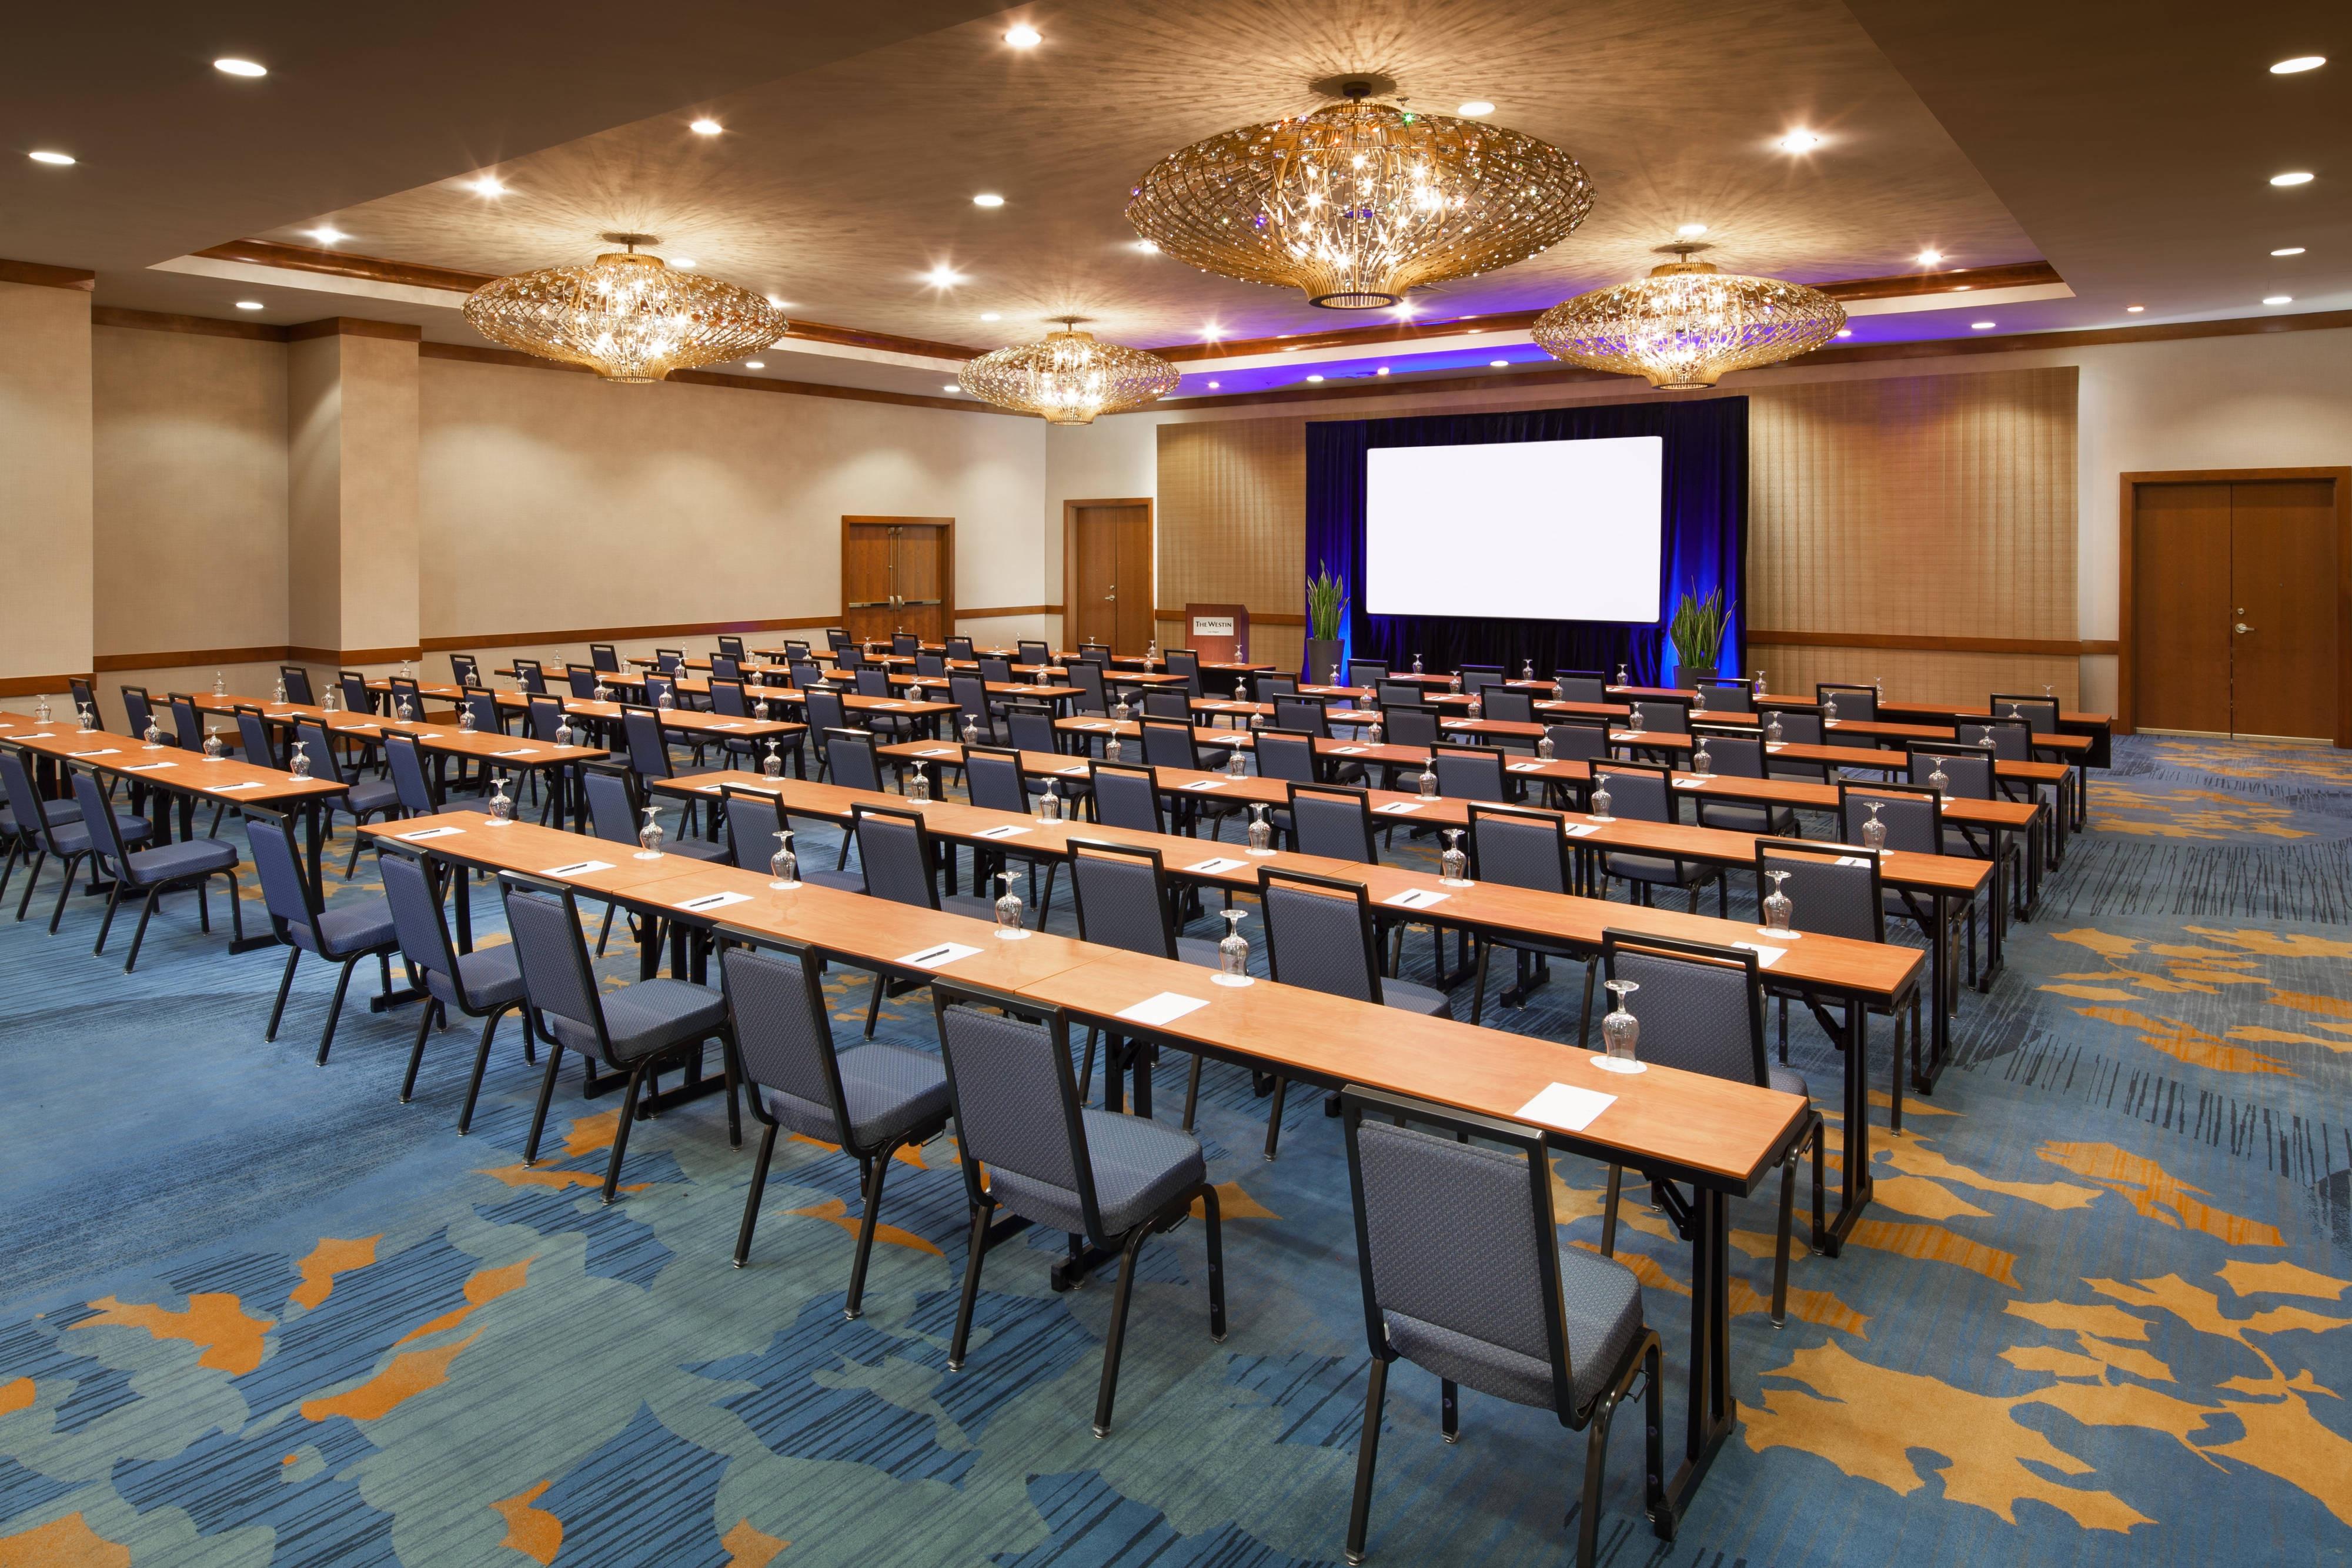 The Acacia Ballroom - Classroom Style